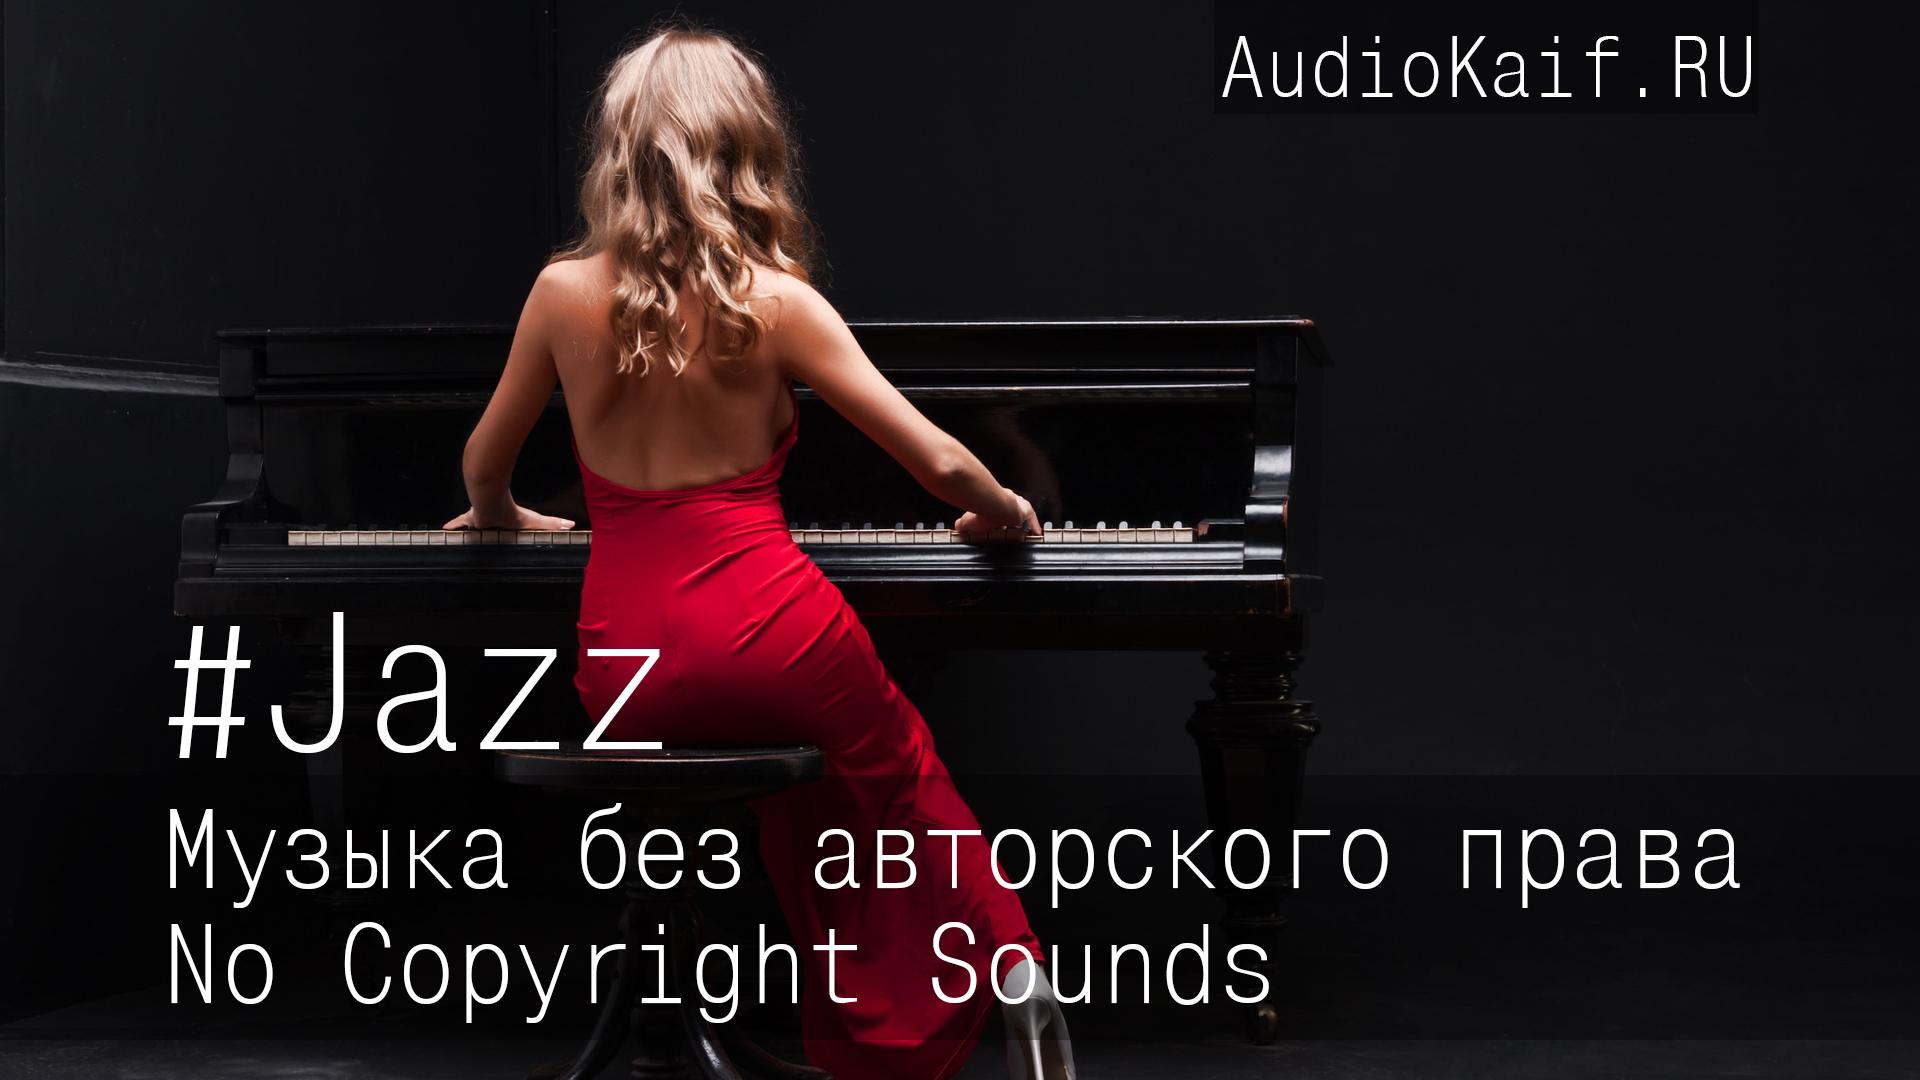 Музыка без авторского права / Tomorrow I'll Be Gone / Jazz / музыка ютуб видео